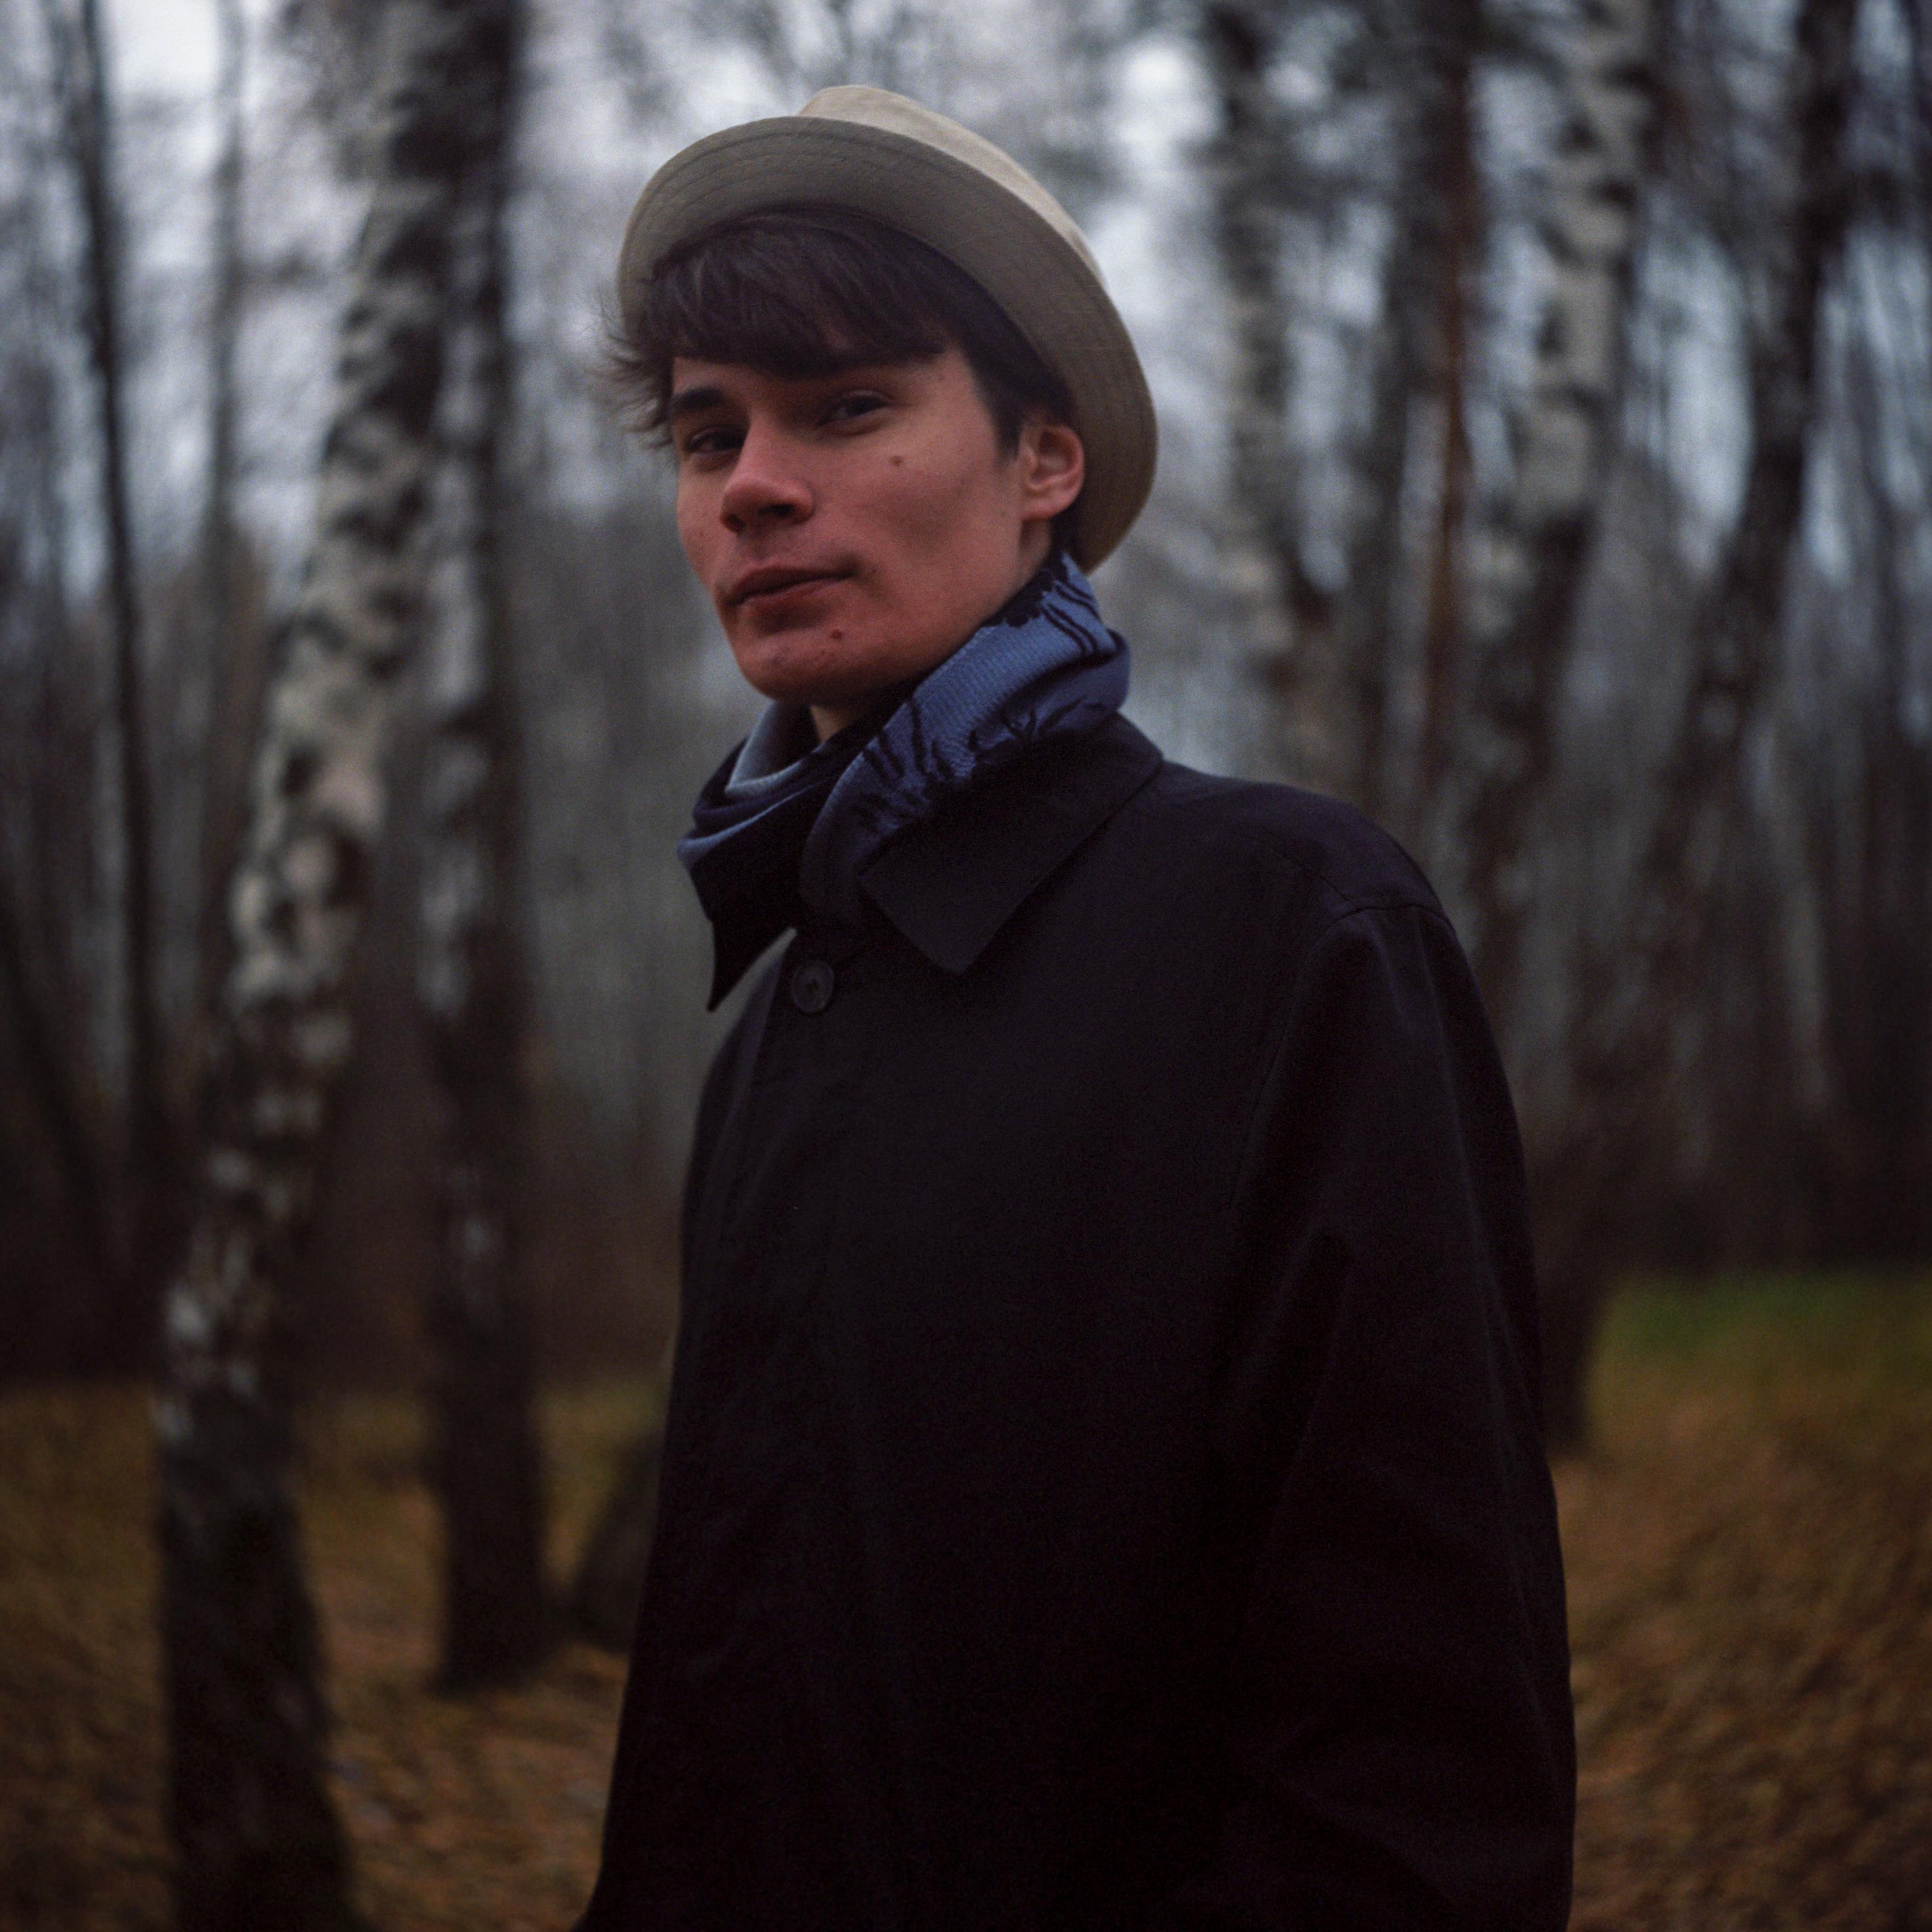 парень лес портрет шляпа плащ пальто фото берёзы 6x6 плёнка фотоплёнка средний форма ikoflex kodak porta 160, Иванов Юрий